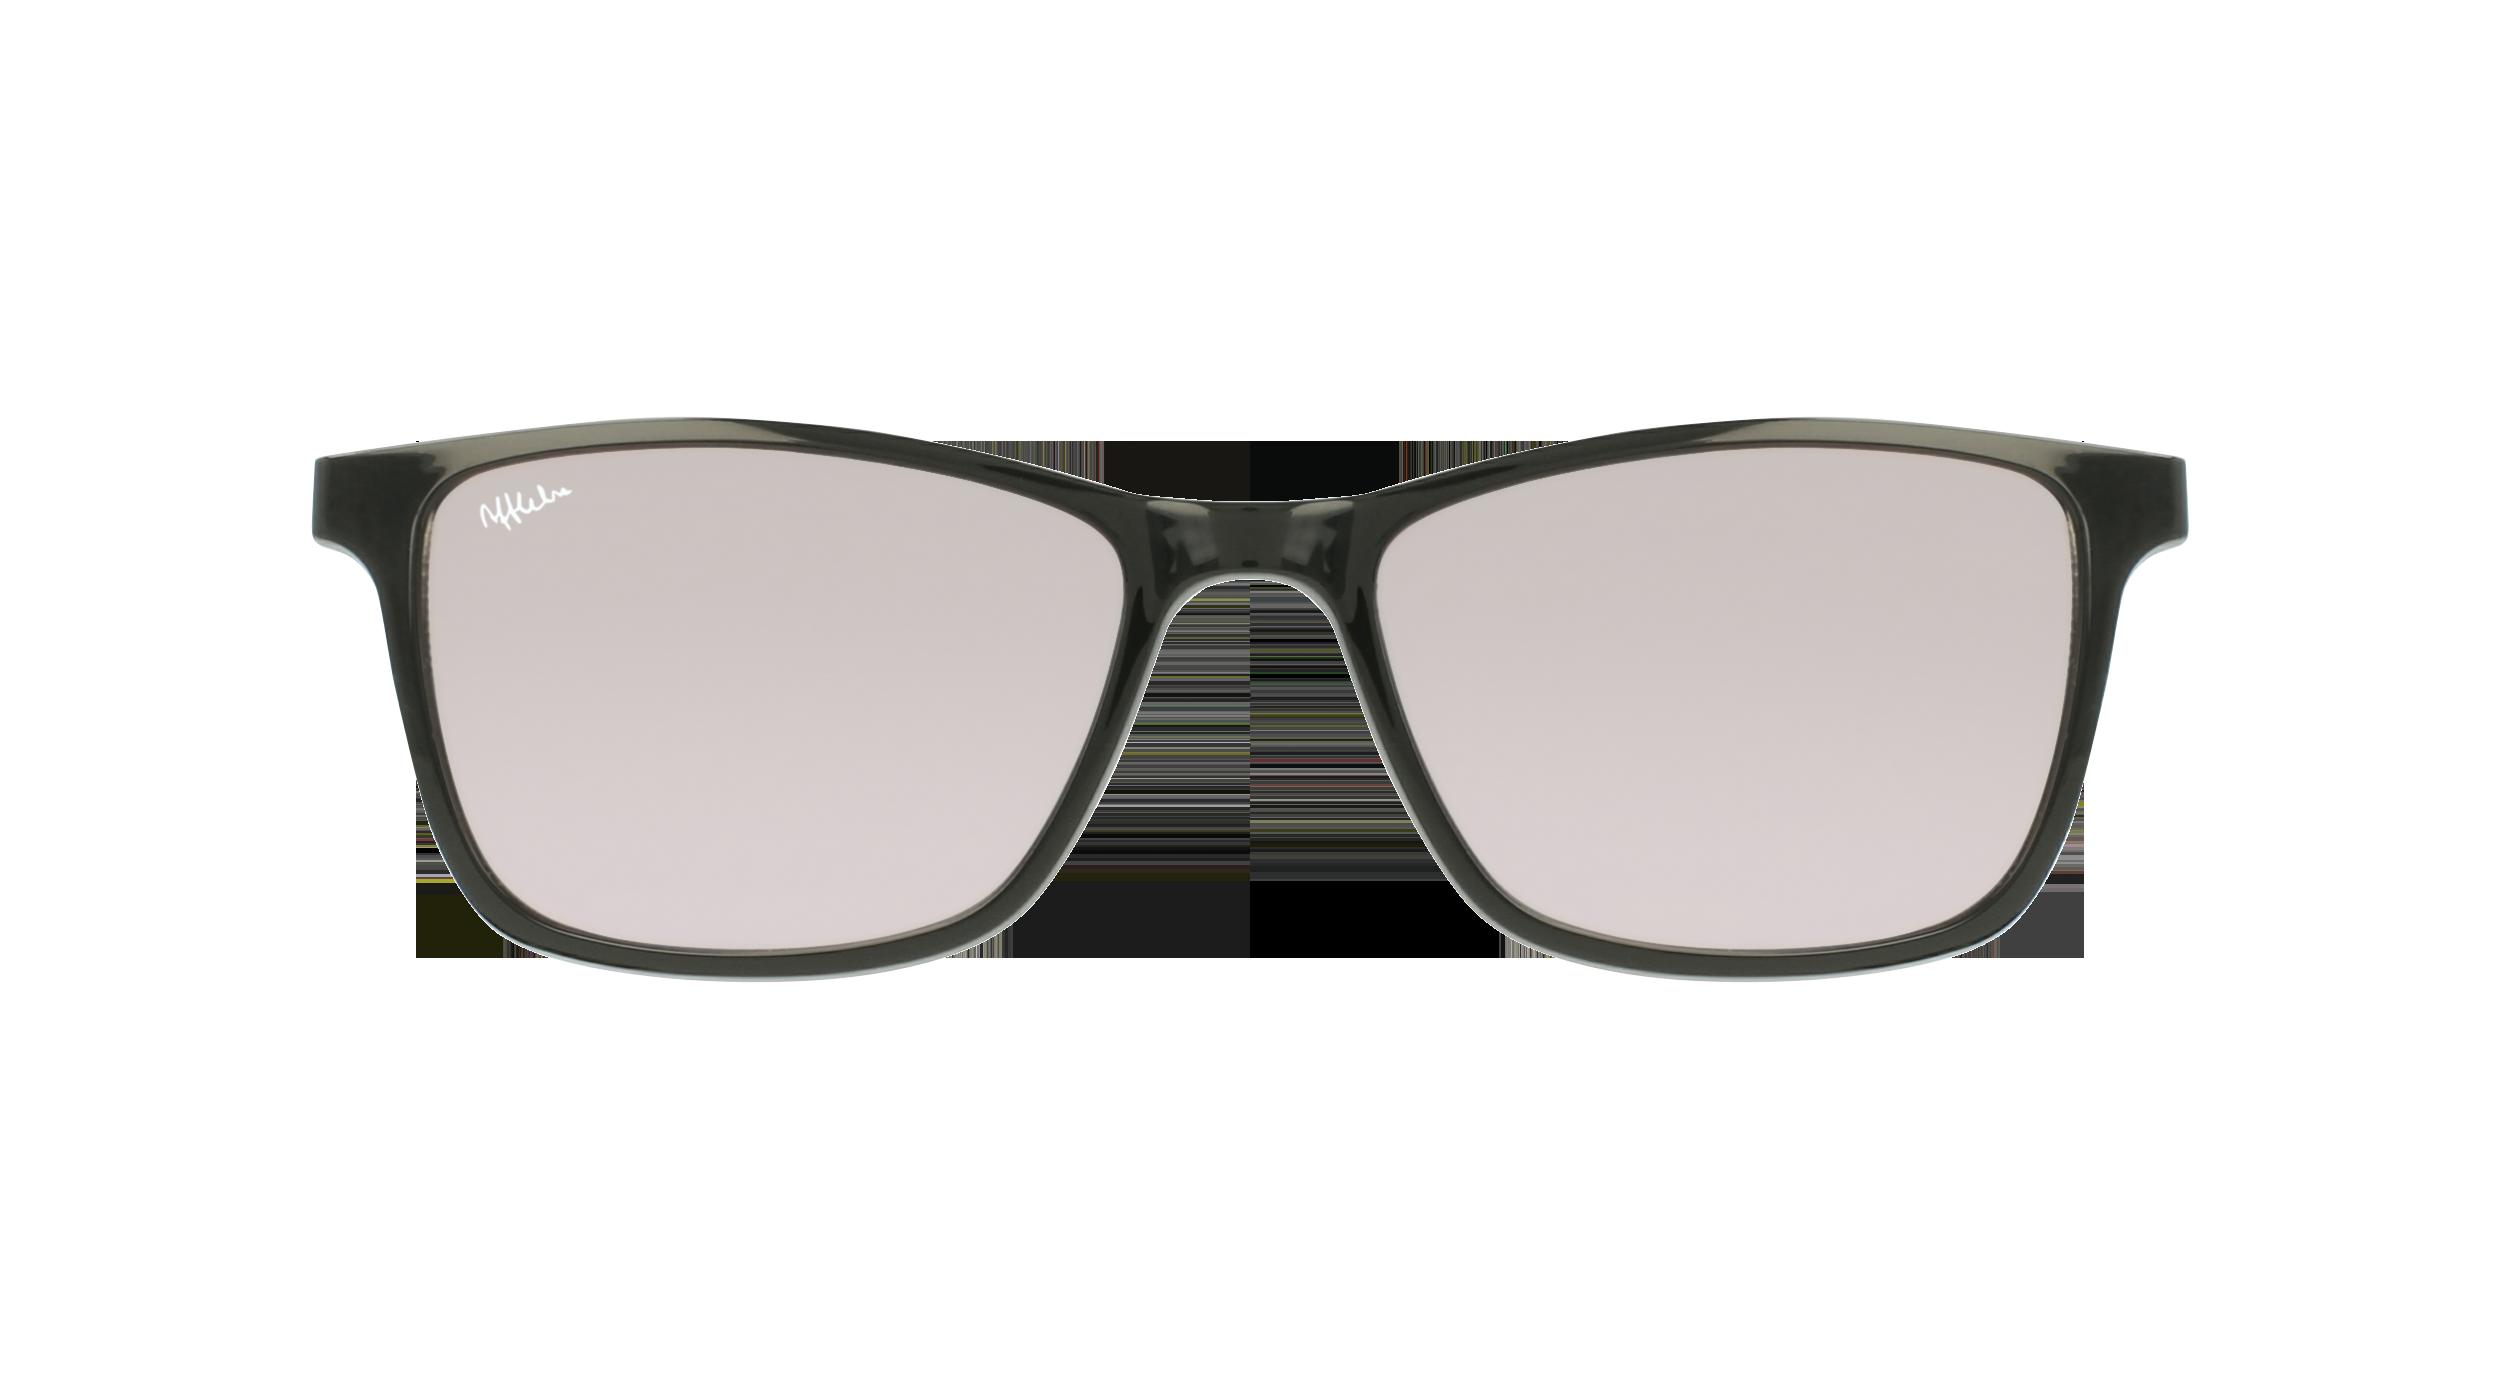 afflelou/france/products/smart_clip/clips_glasses/07630036457740.png